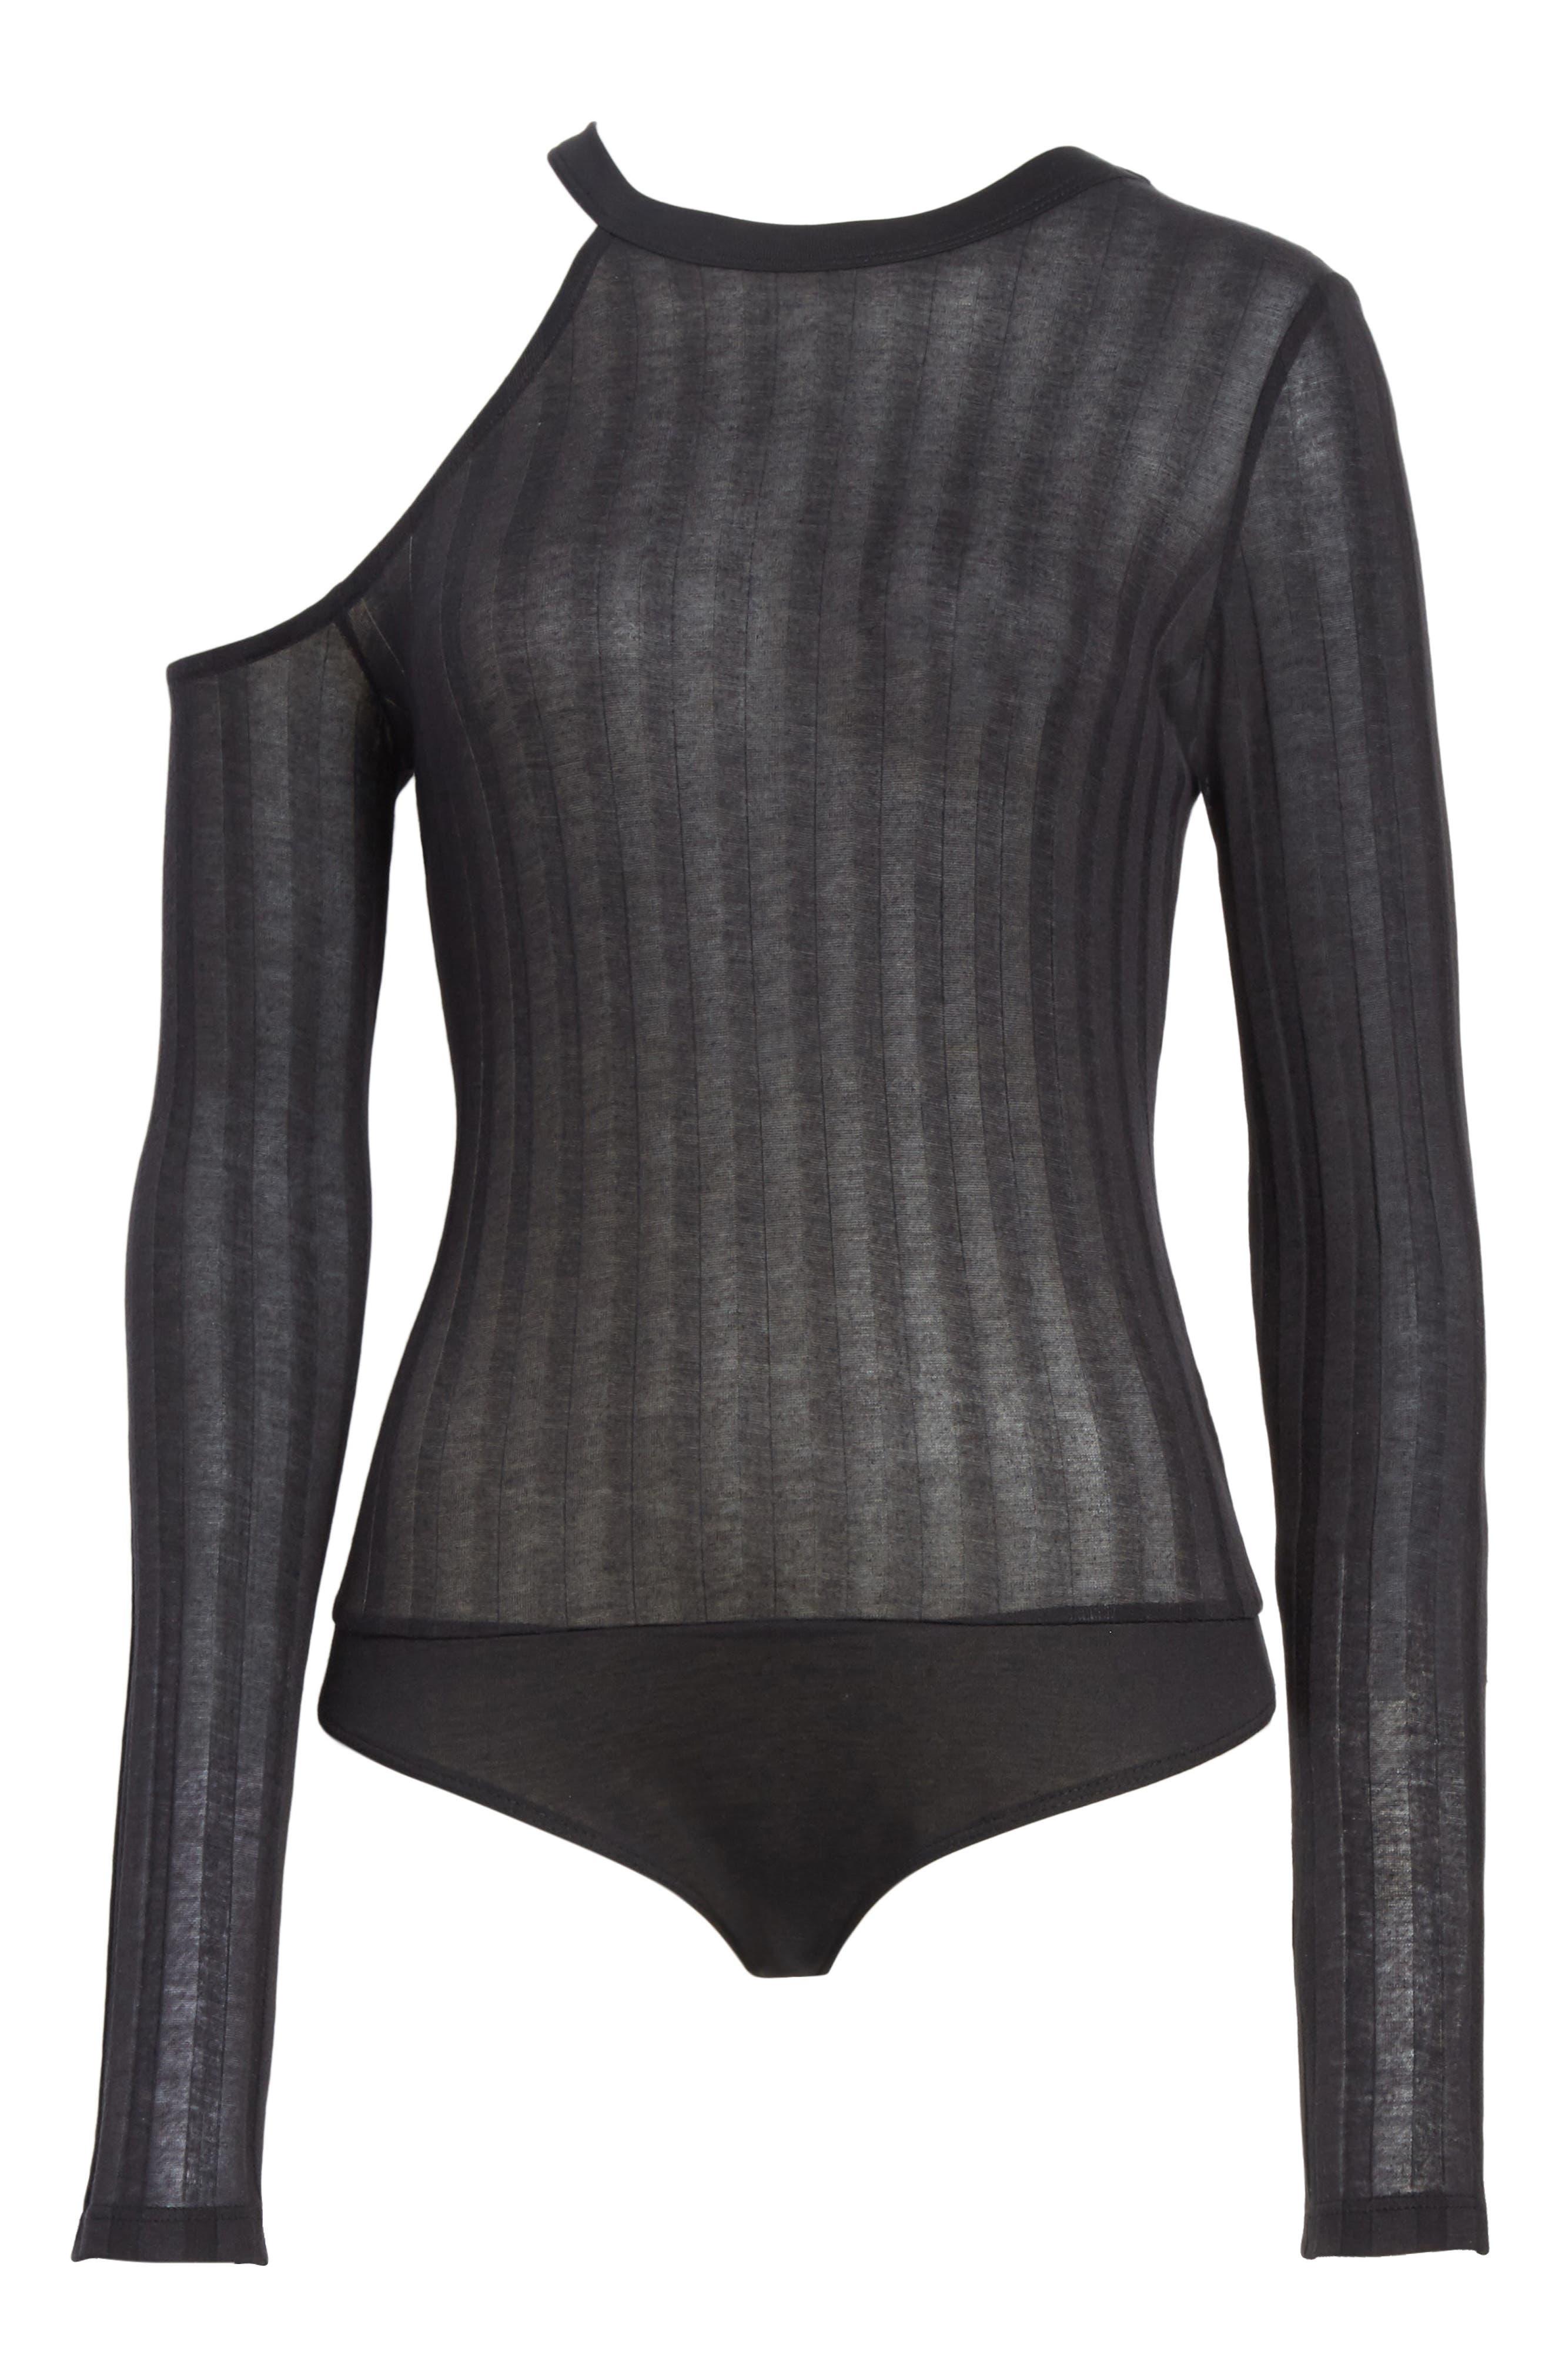 Lookout One-Shoulder Jersey Bodysuit,                             Alternate thumbnail 6, color,                             Black